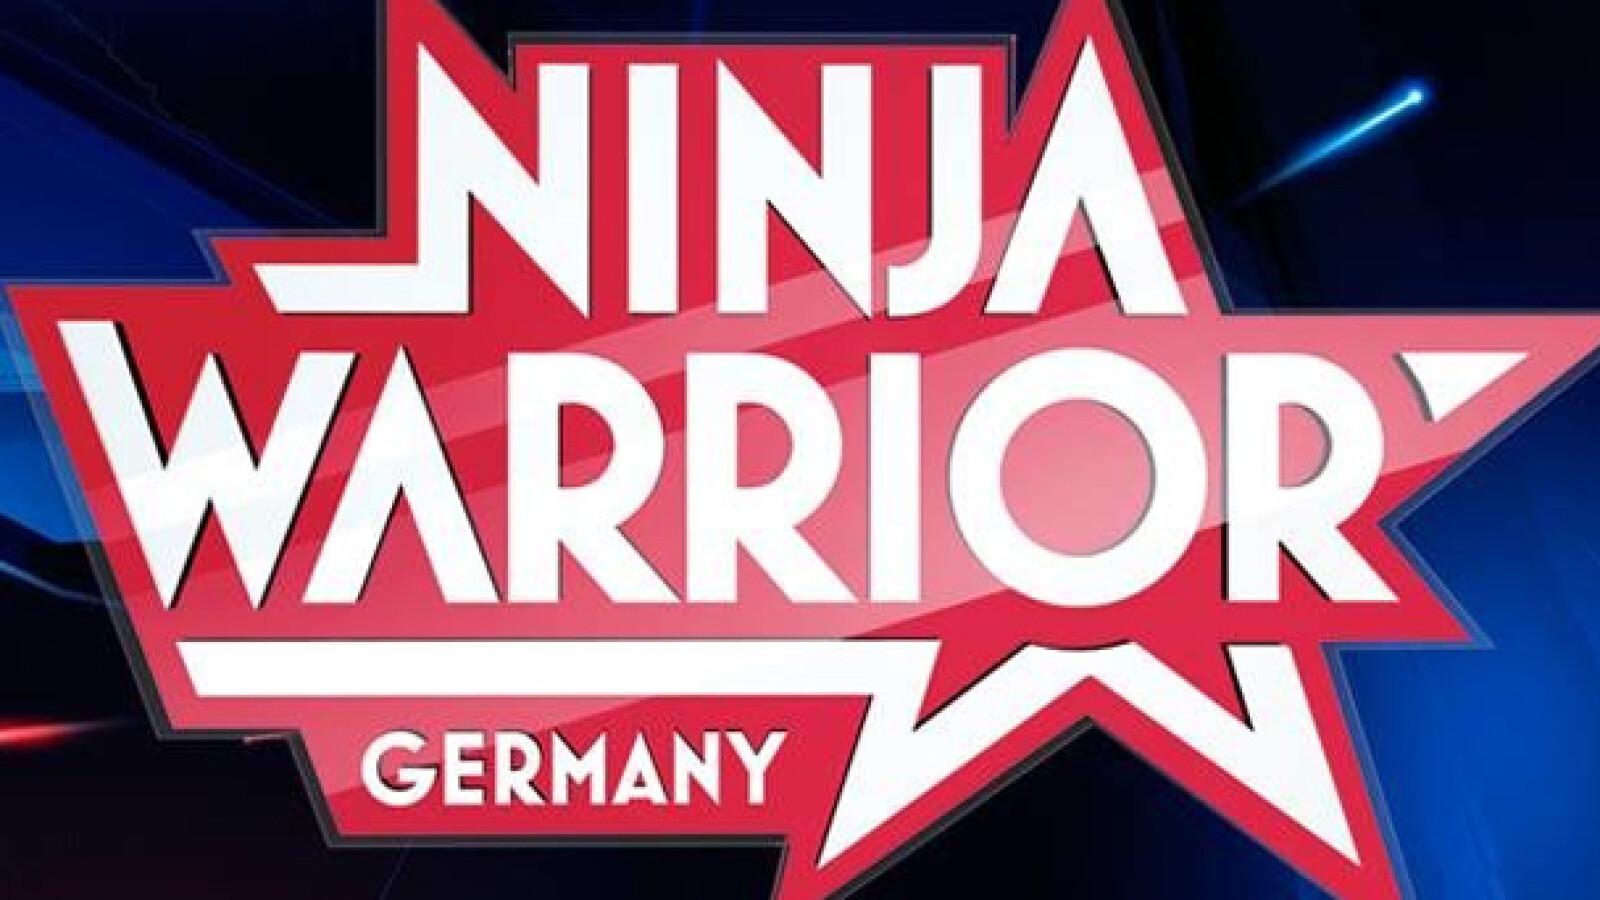 Ninja Warrior Germany 2019 Stream